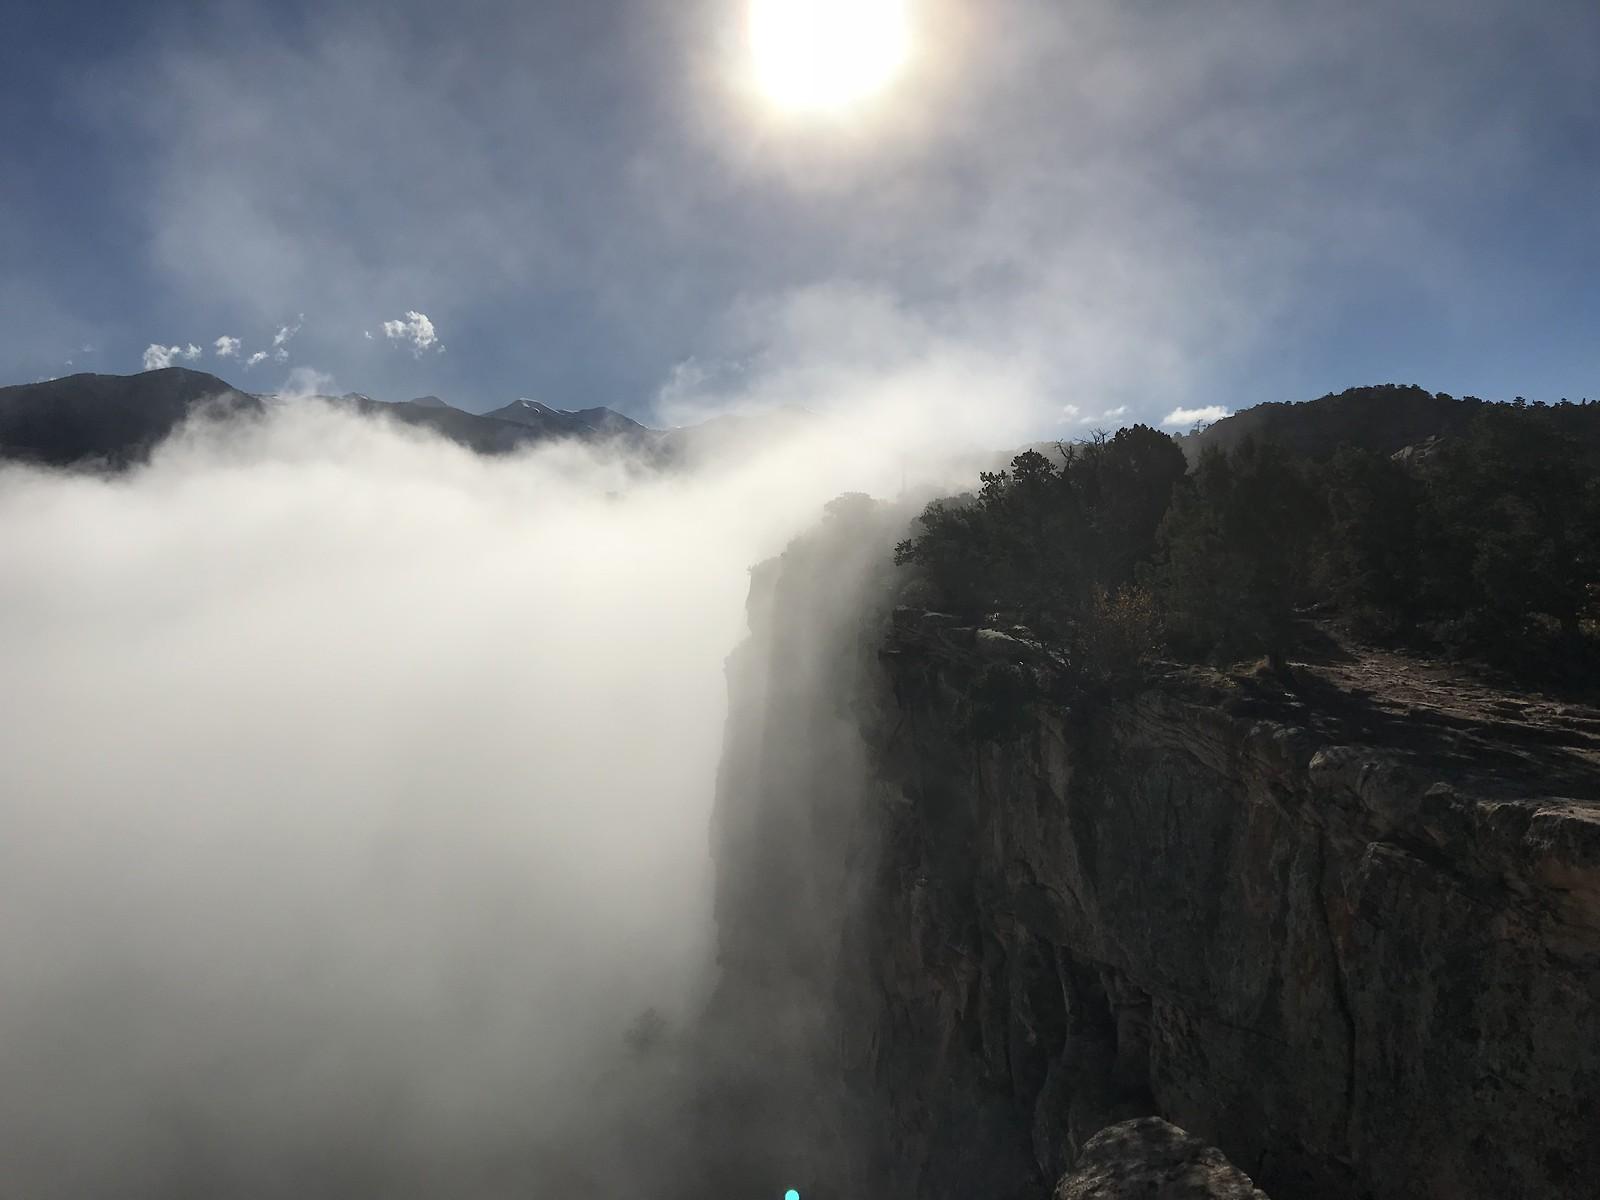 2018-10-24 09 50 24 - FlowyMcFlowerton - Mountain Biking Pictures - Vital MTB